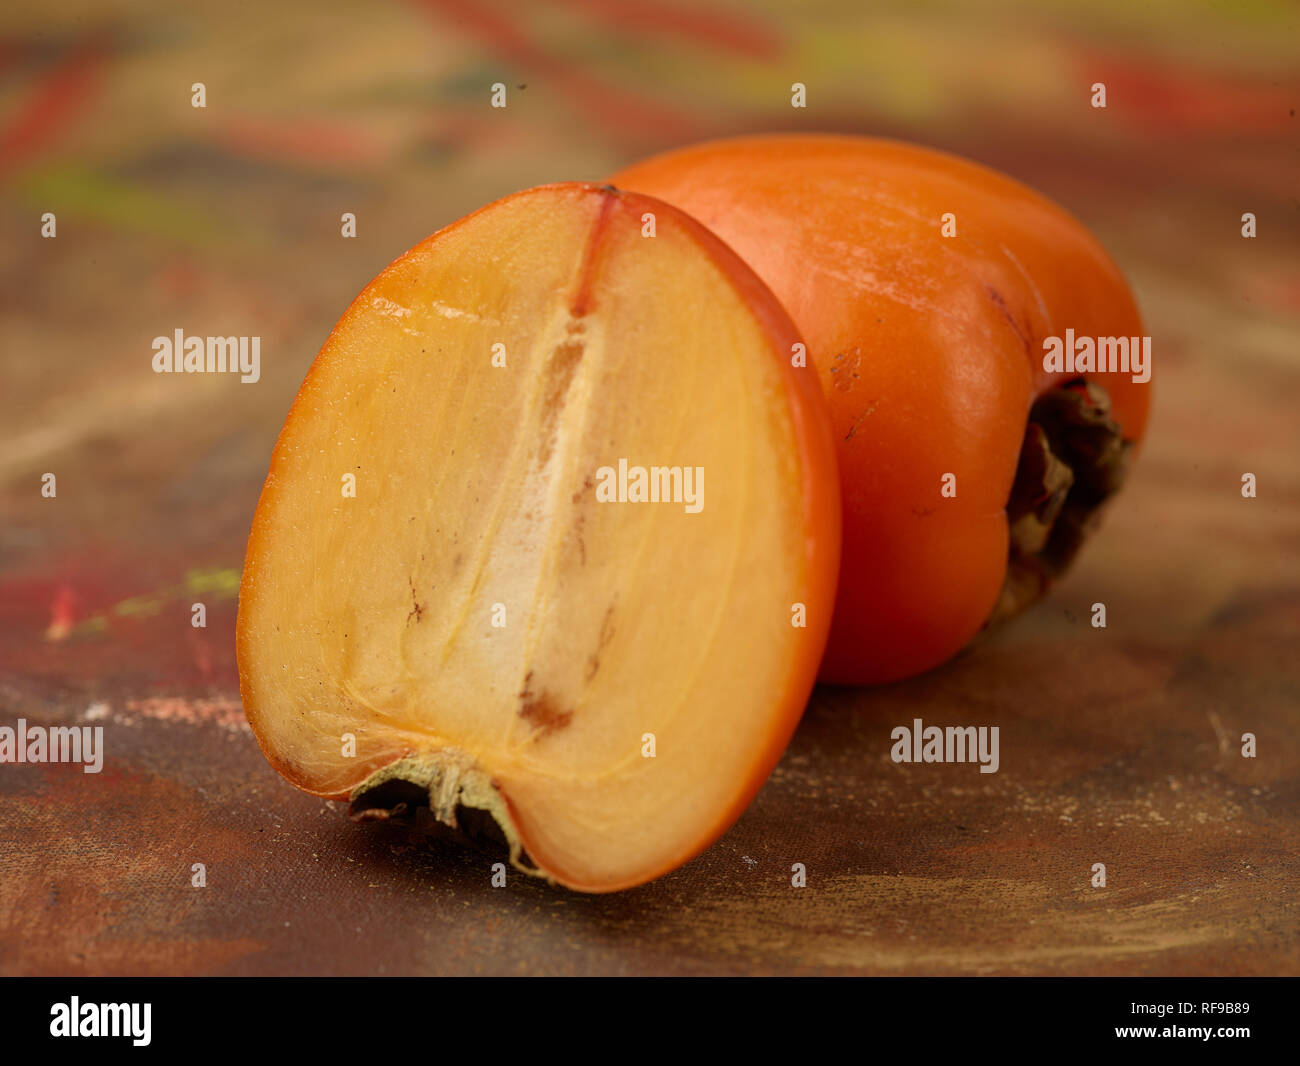 Persimmon, Sharon fruit, food still-life photograph - Stock Image